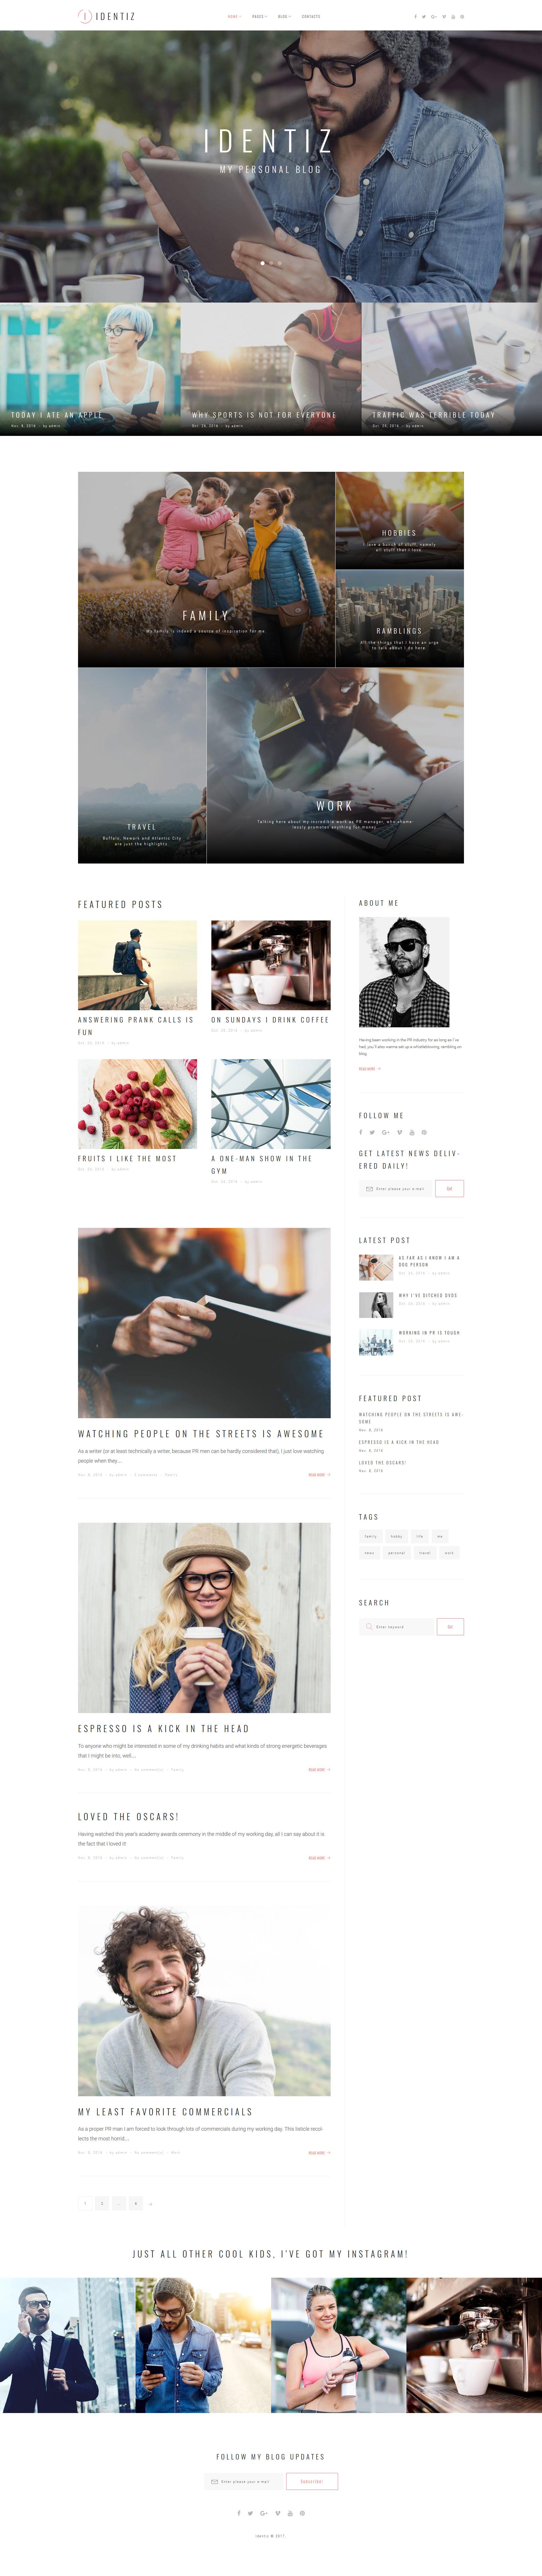 Responsivt Identiz - Personal Blog WordPress-tema #63592 - skärmbild